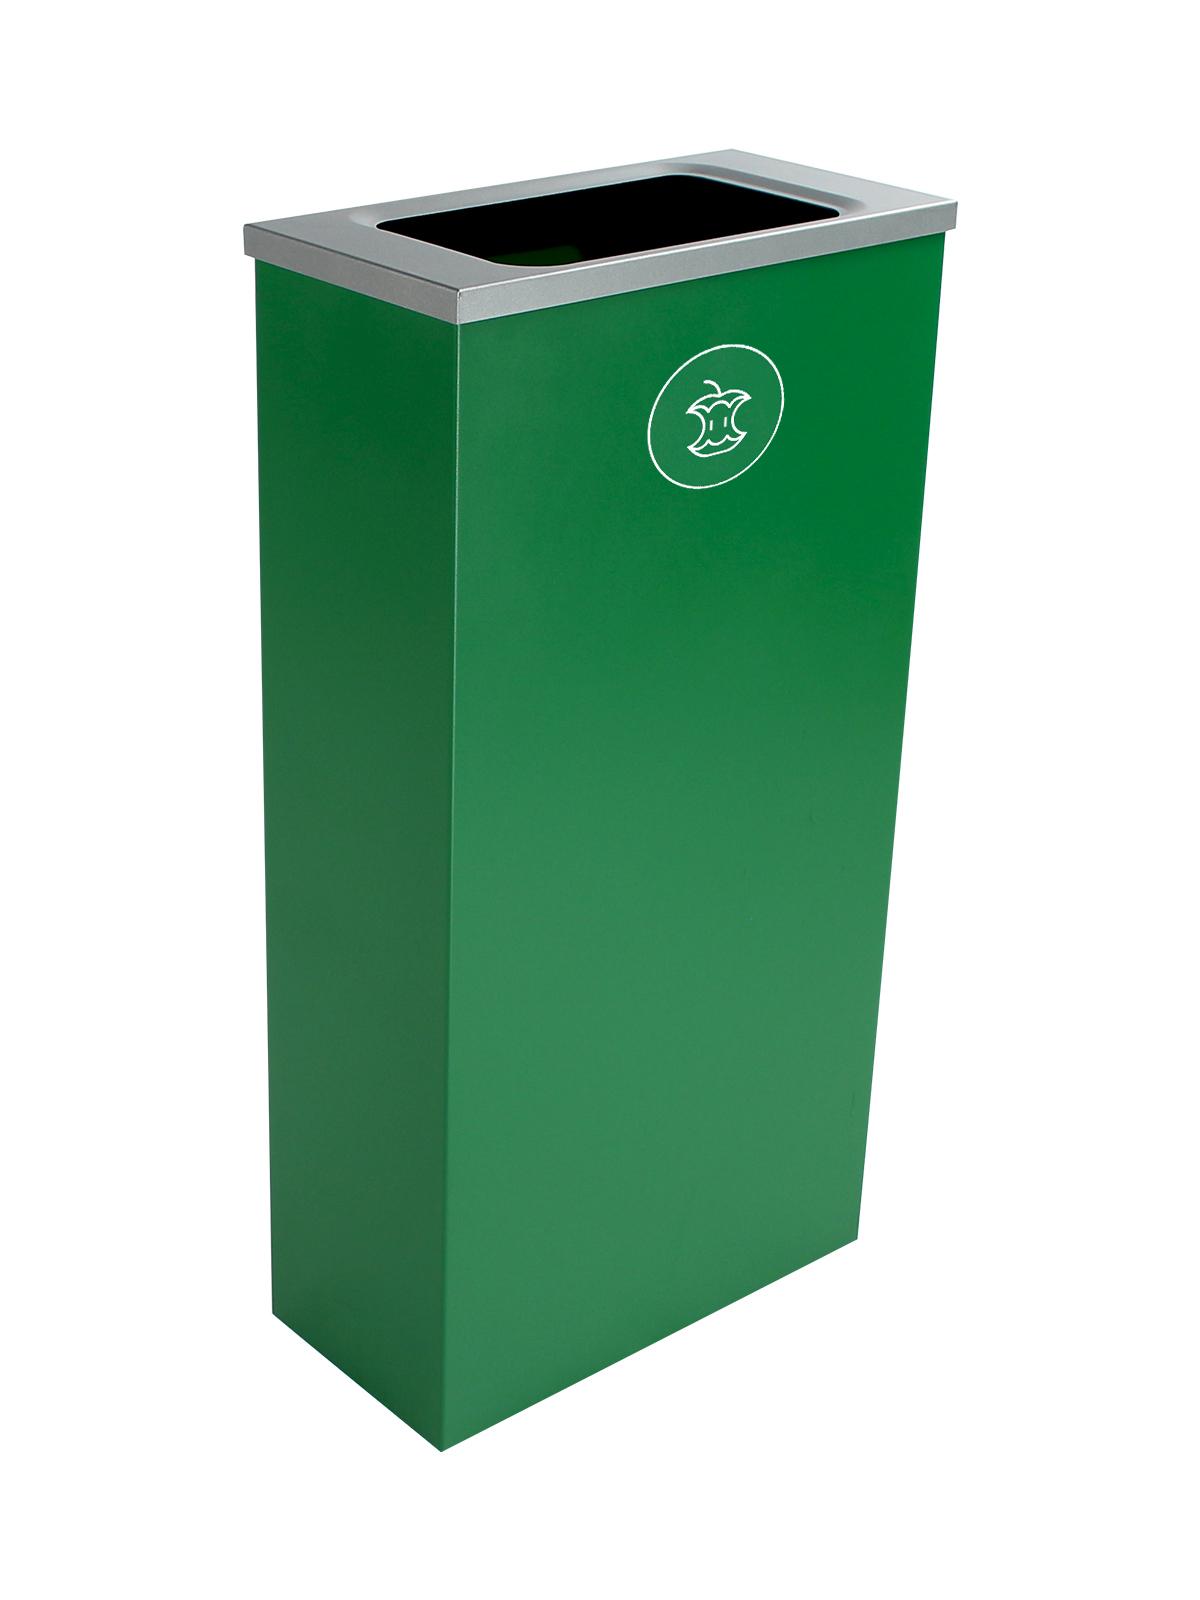 SPECTRUM - Single - Cube Slim - Organics - Full - Dark Green